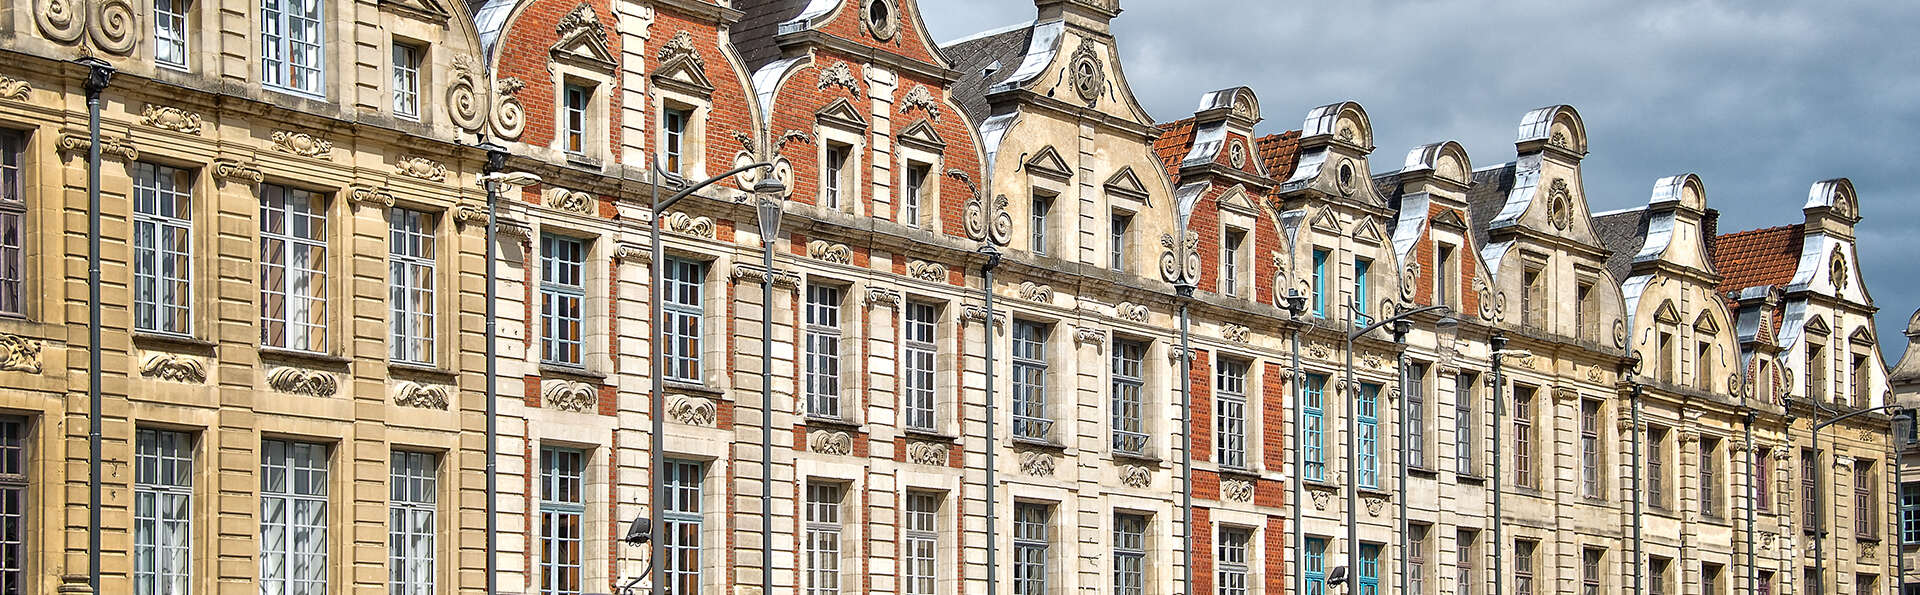 Zenia Hôtel et Spa - Edit_Arras3.jpg